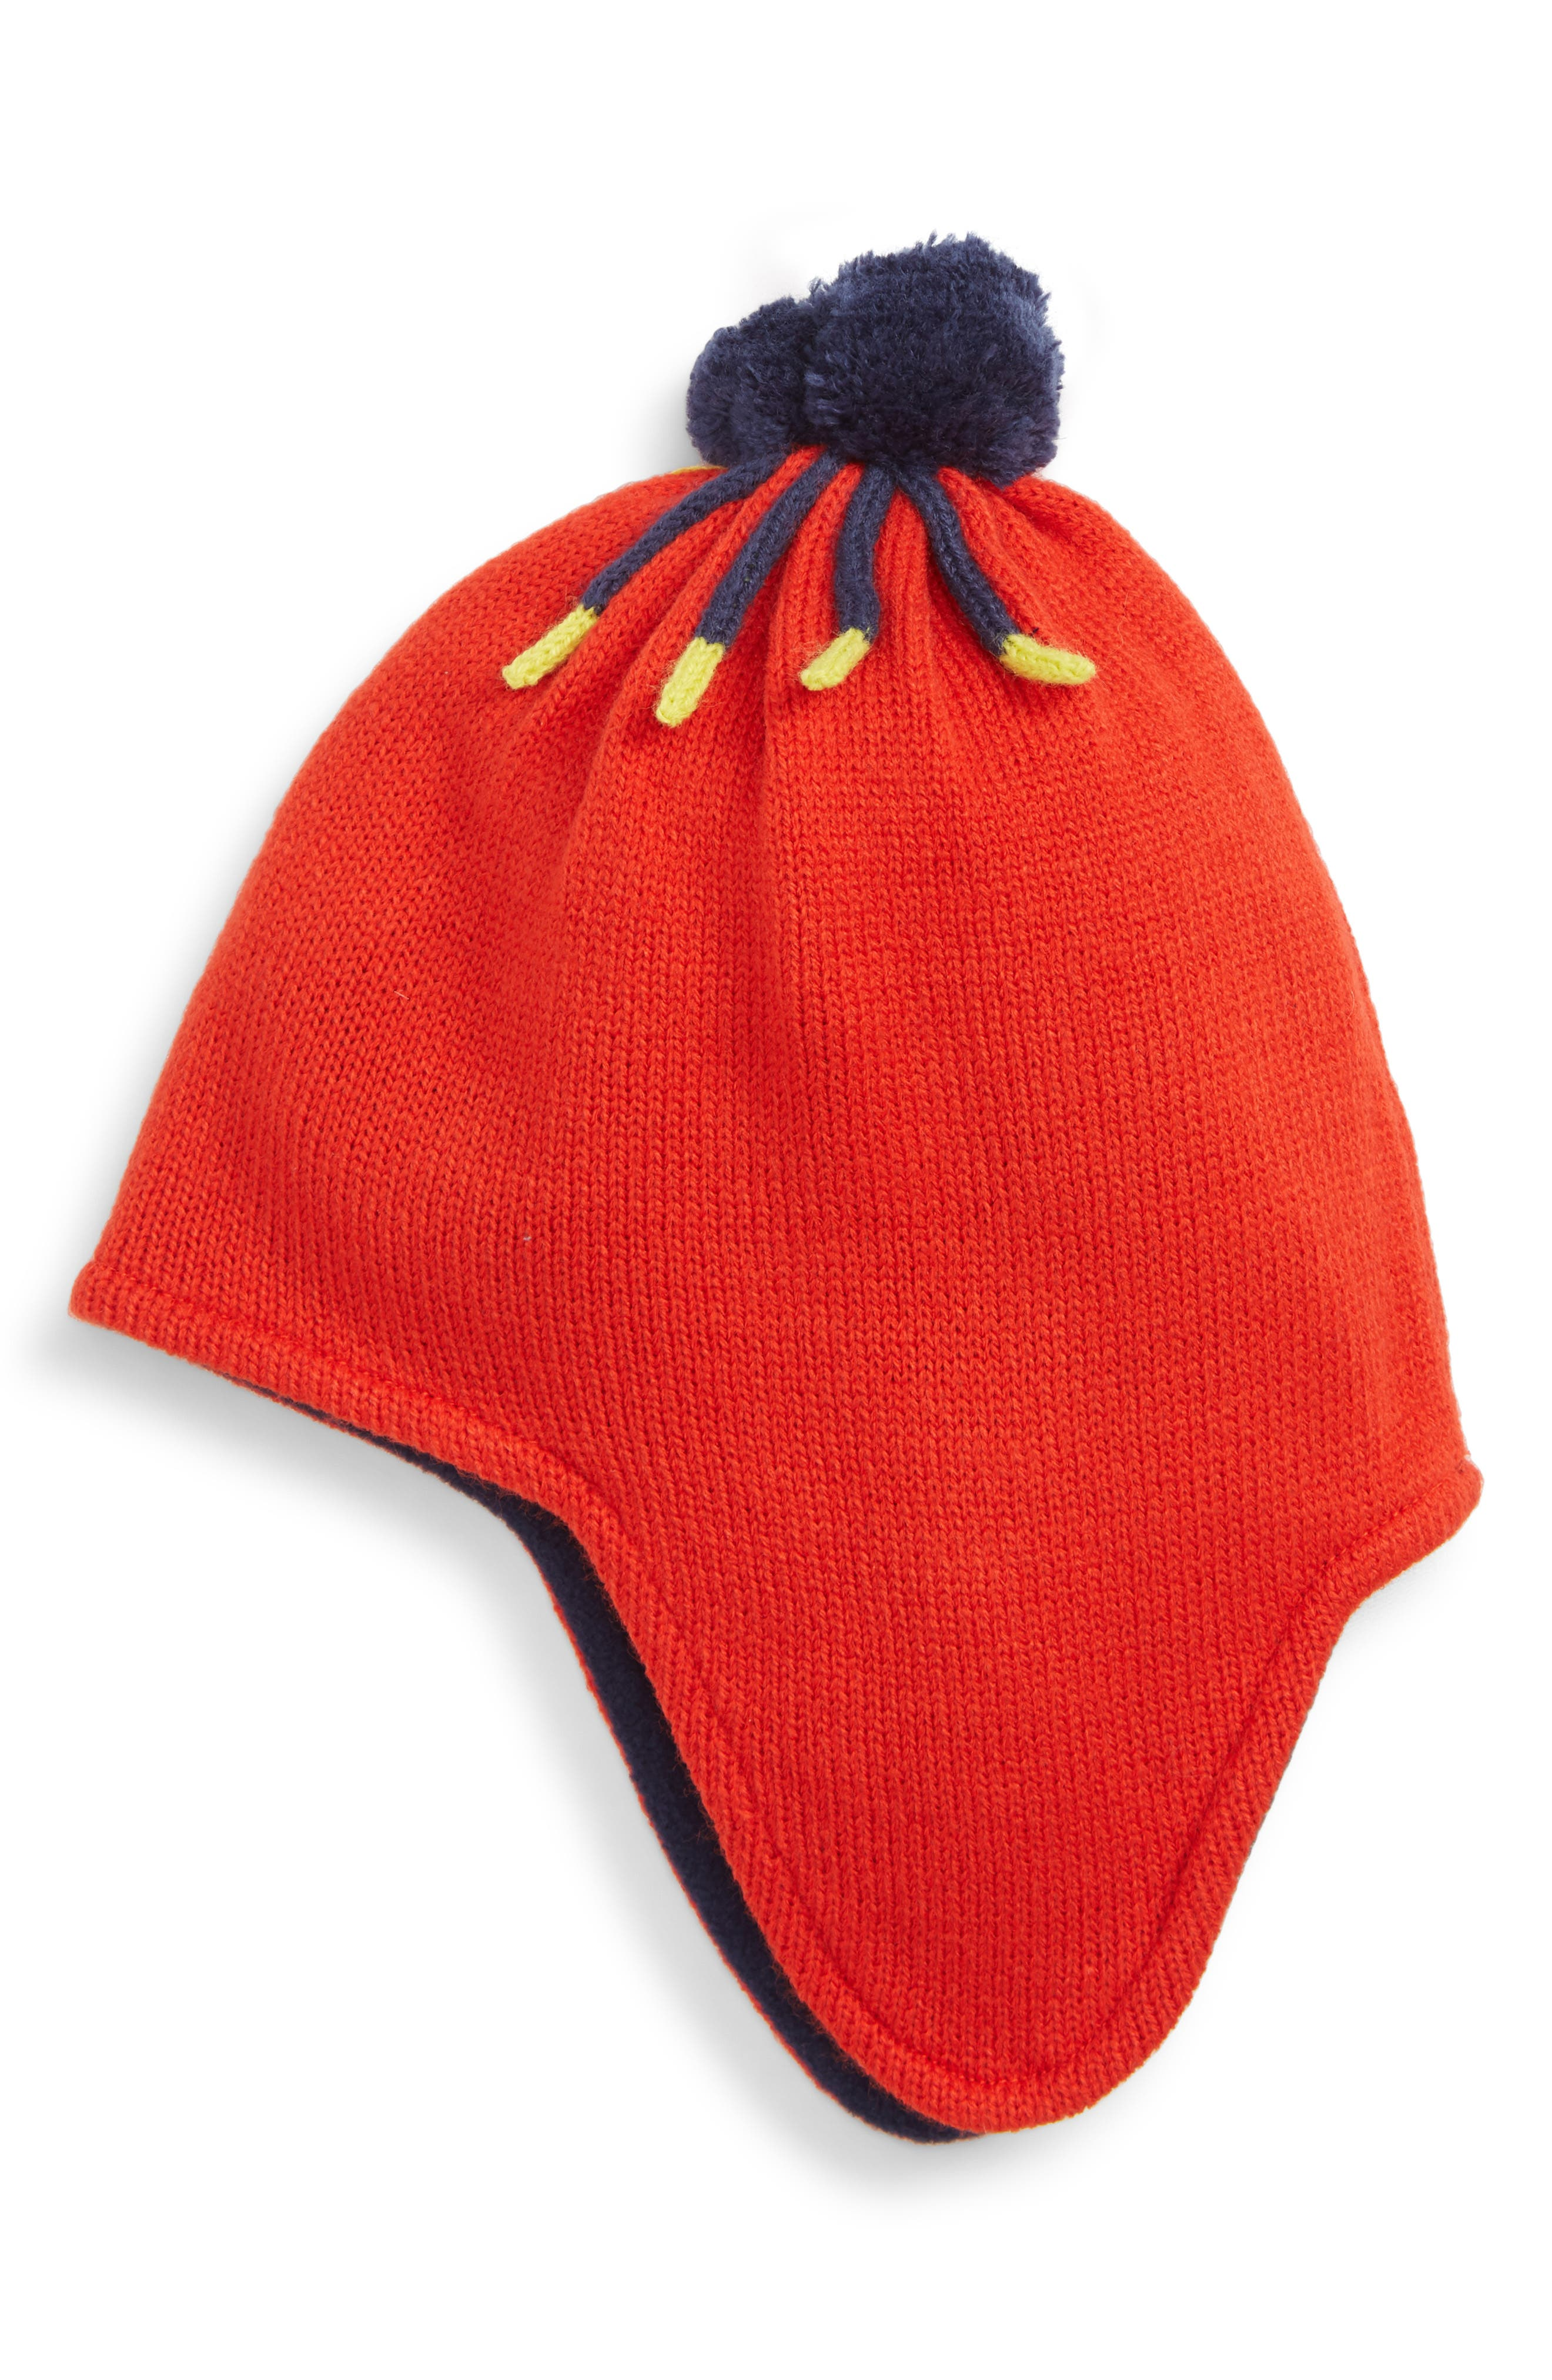 Boys Mini Boden Pom Cable Knit Hat